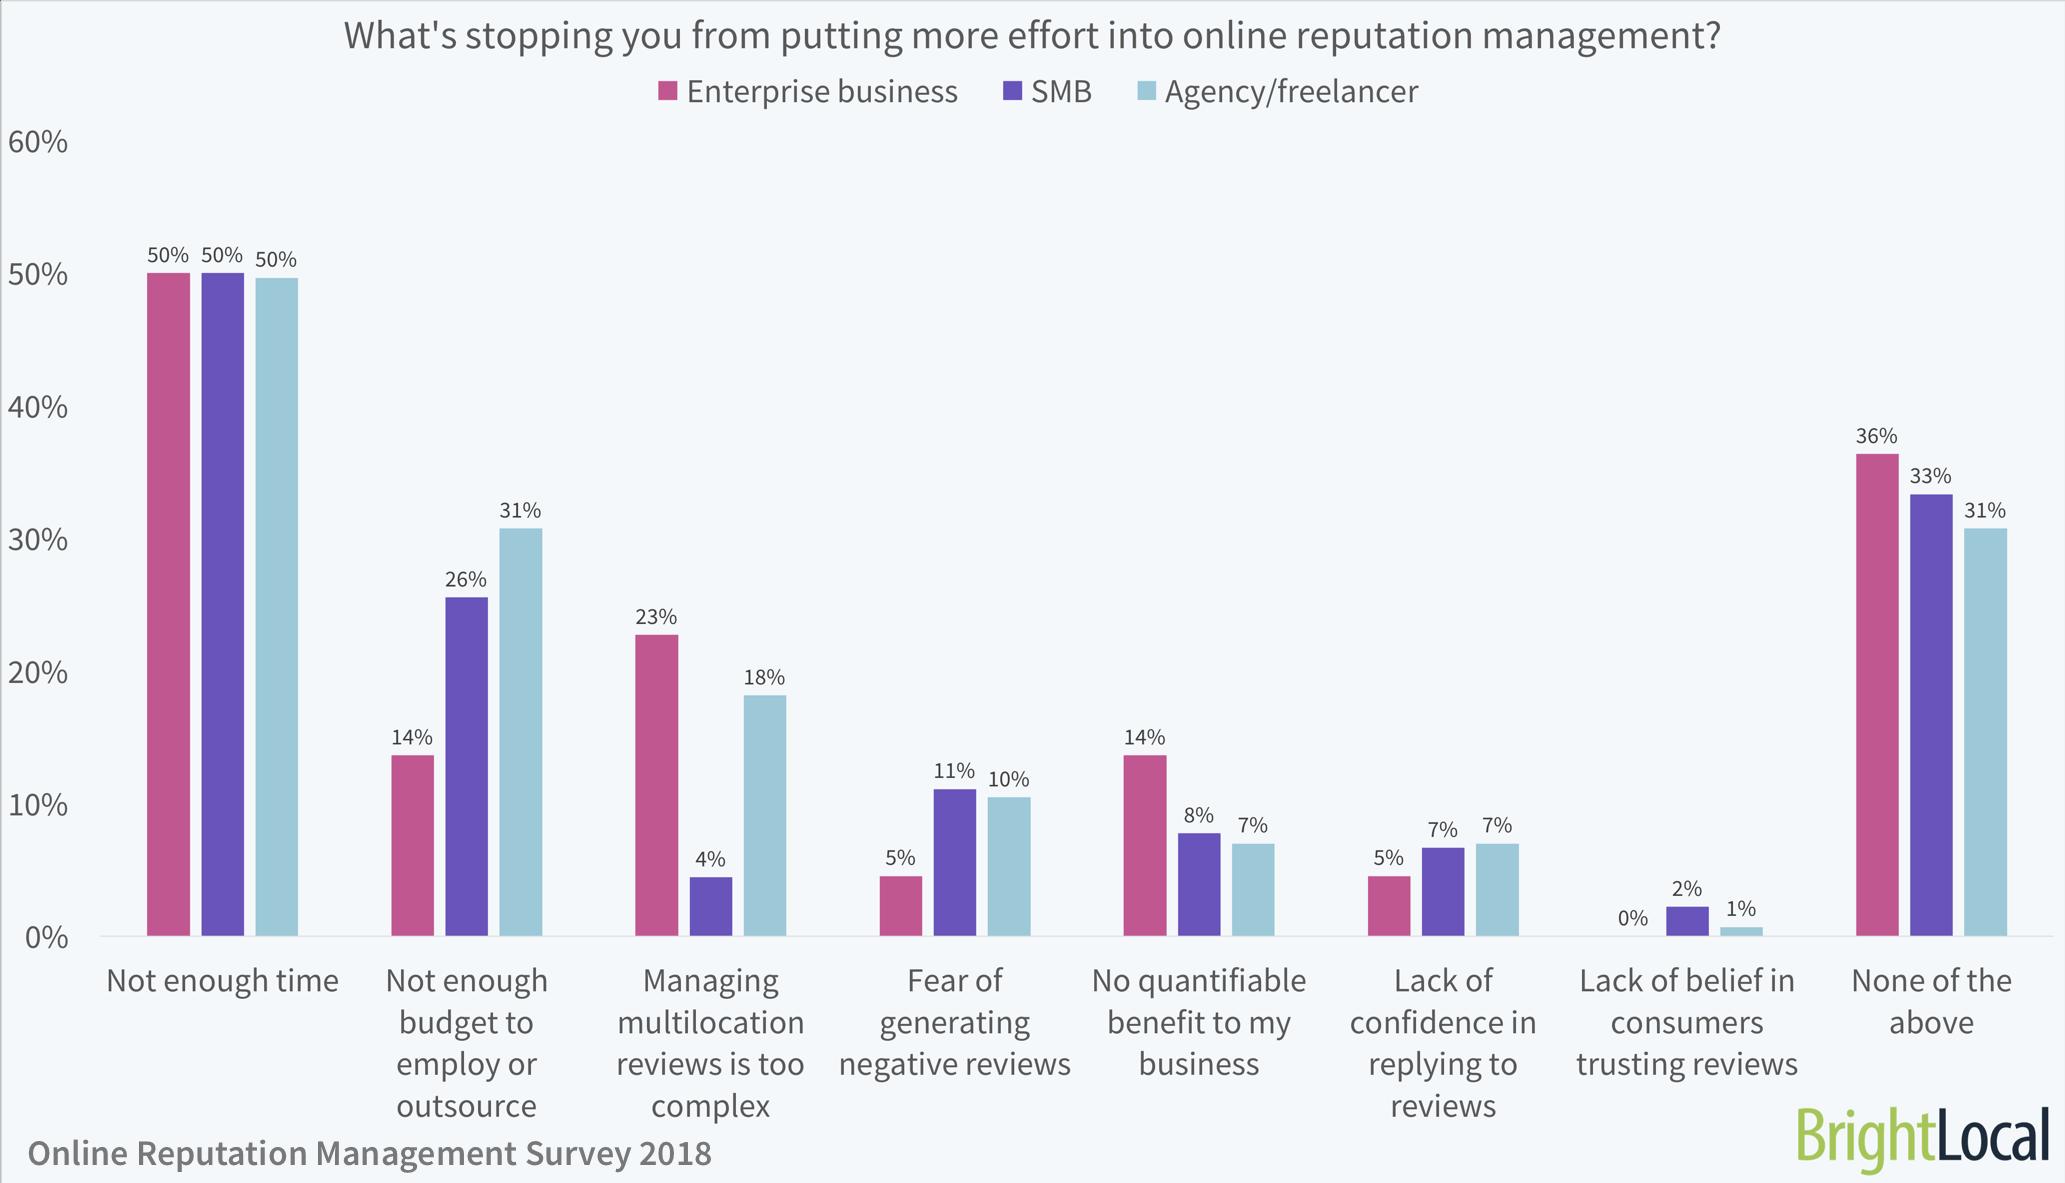 Online Reputation Management Survey - 5